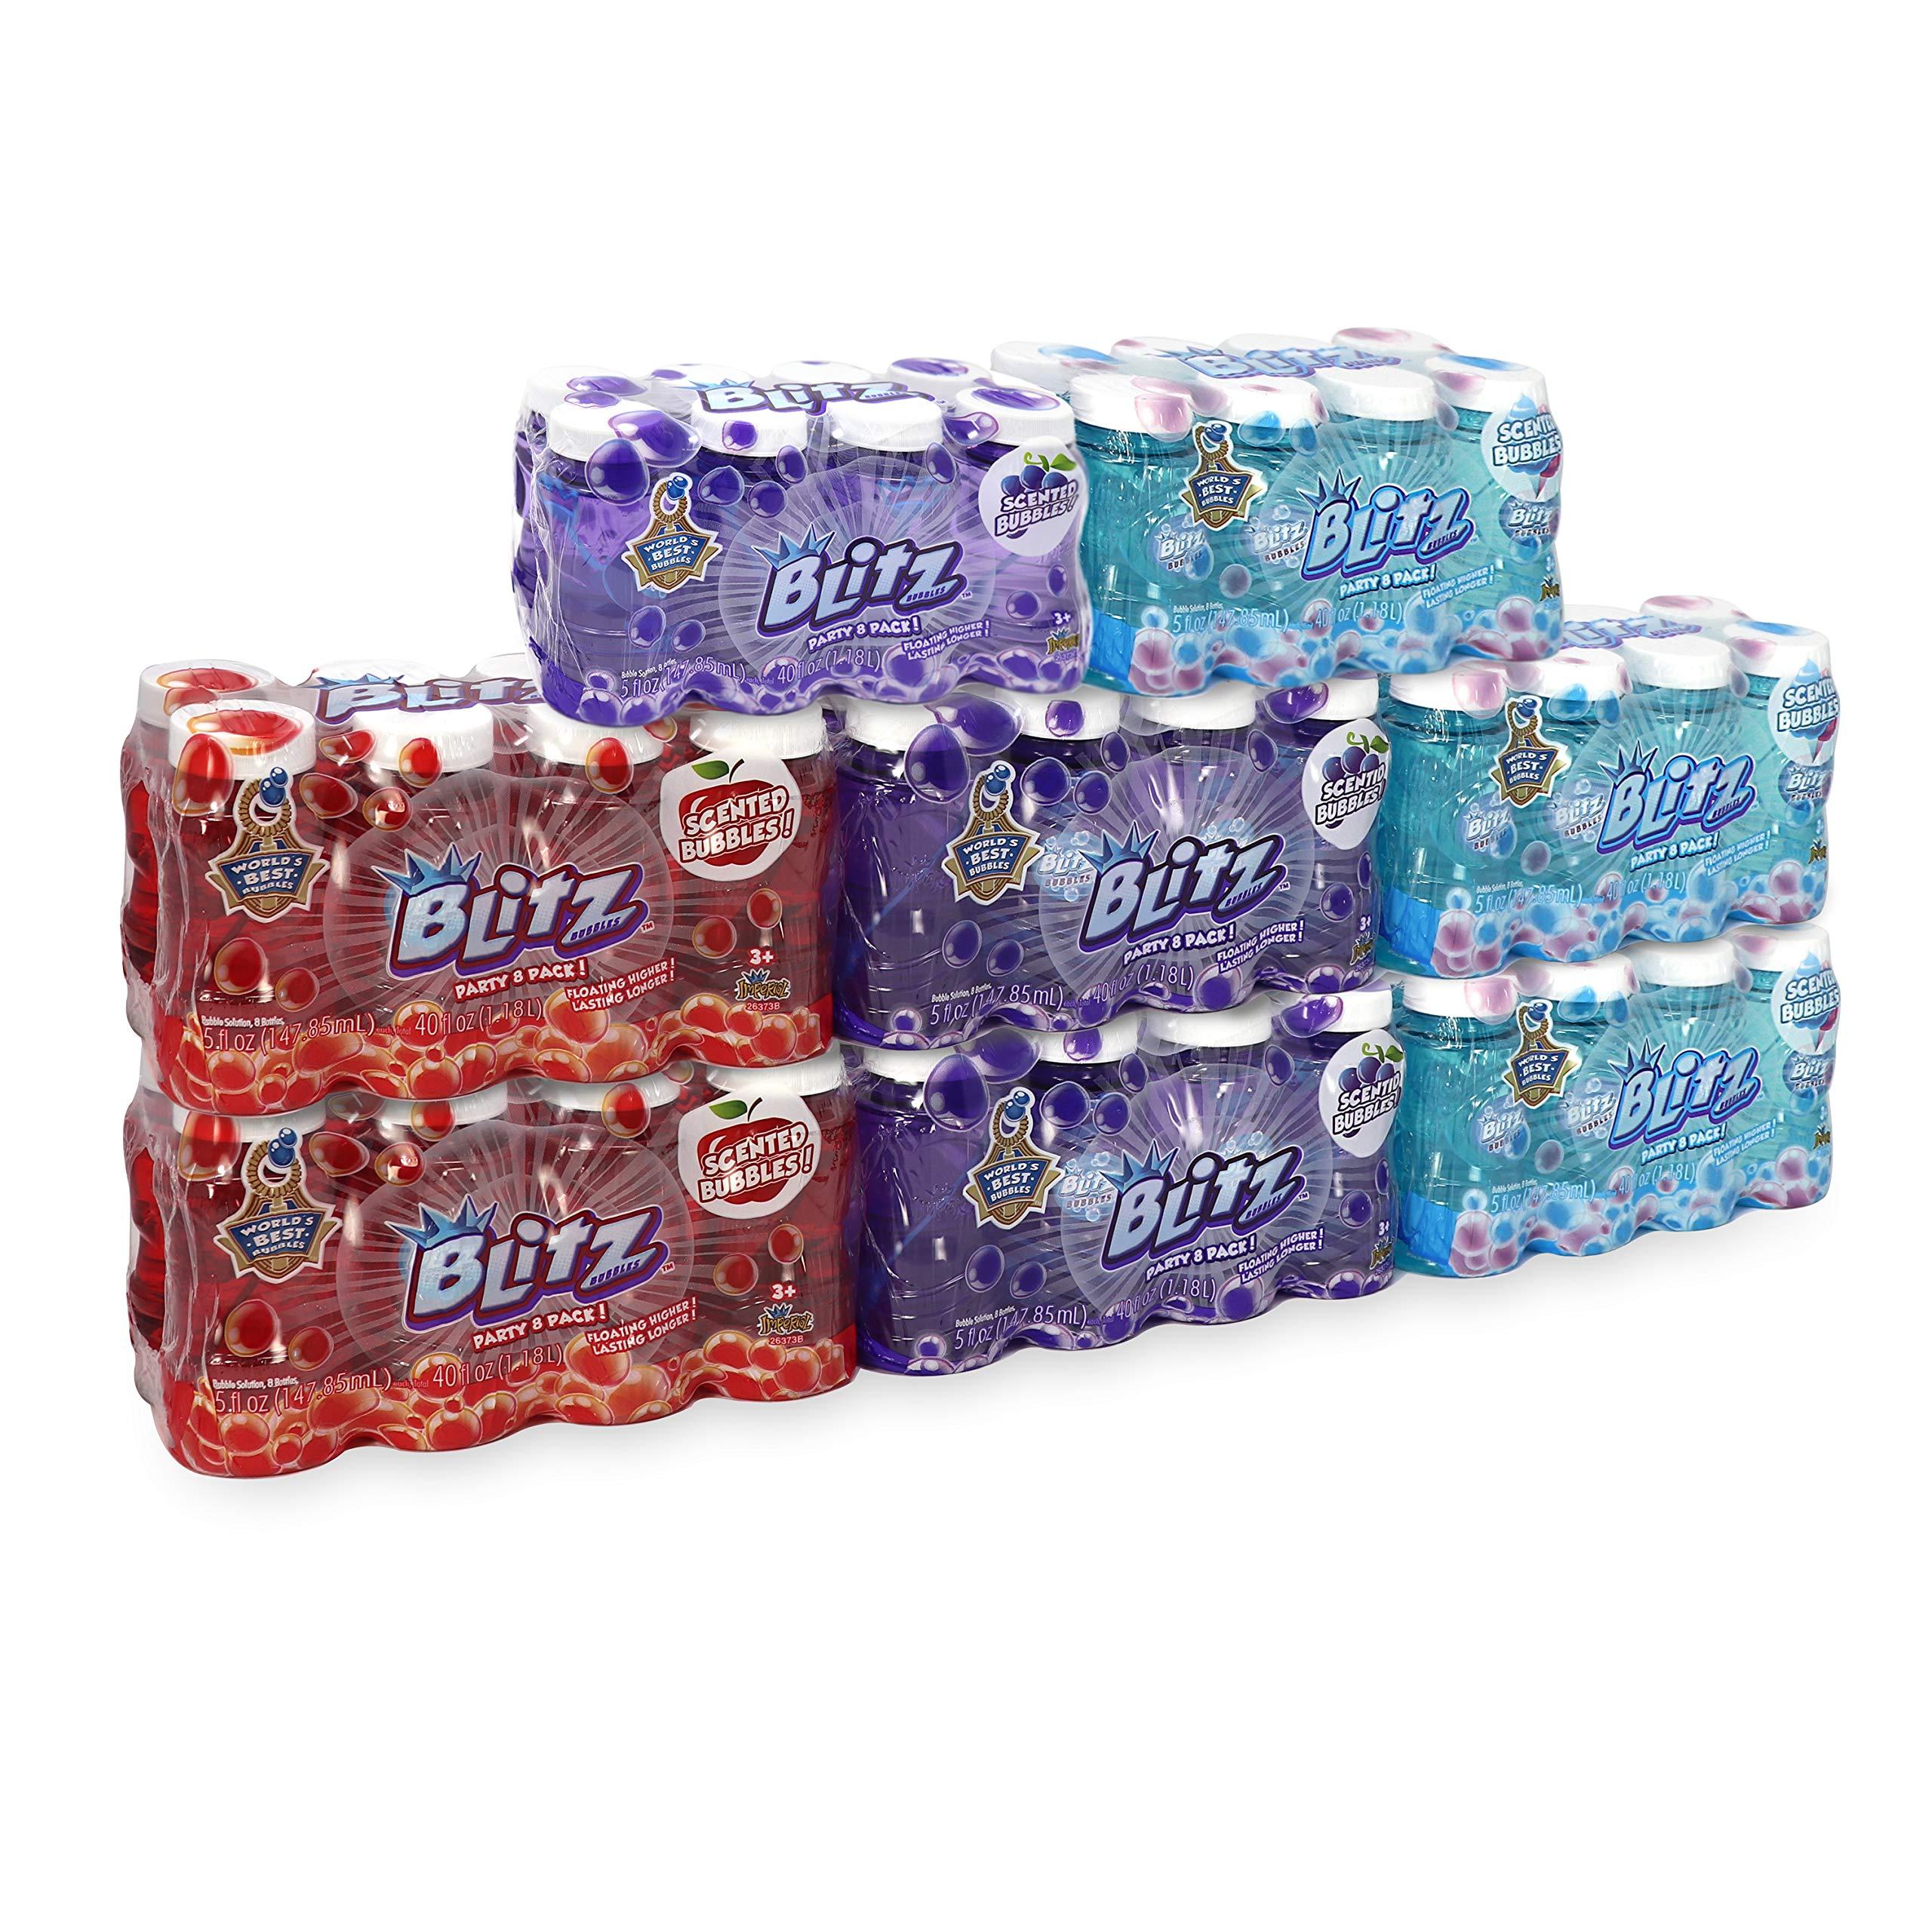 Blitz Scented Bubble Solution, Party Pack of 64 Bottles, 5 oz Each by Blitz Premium Scented Bubbles (Image #1)